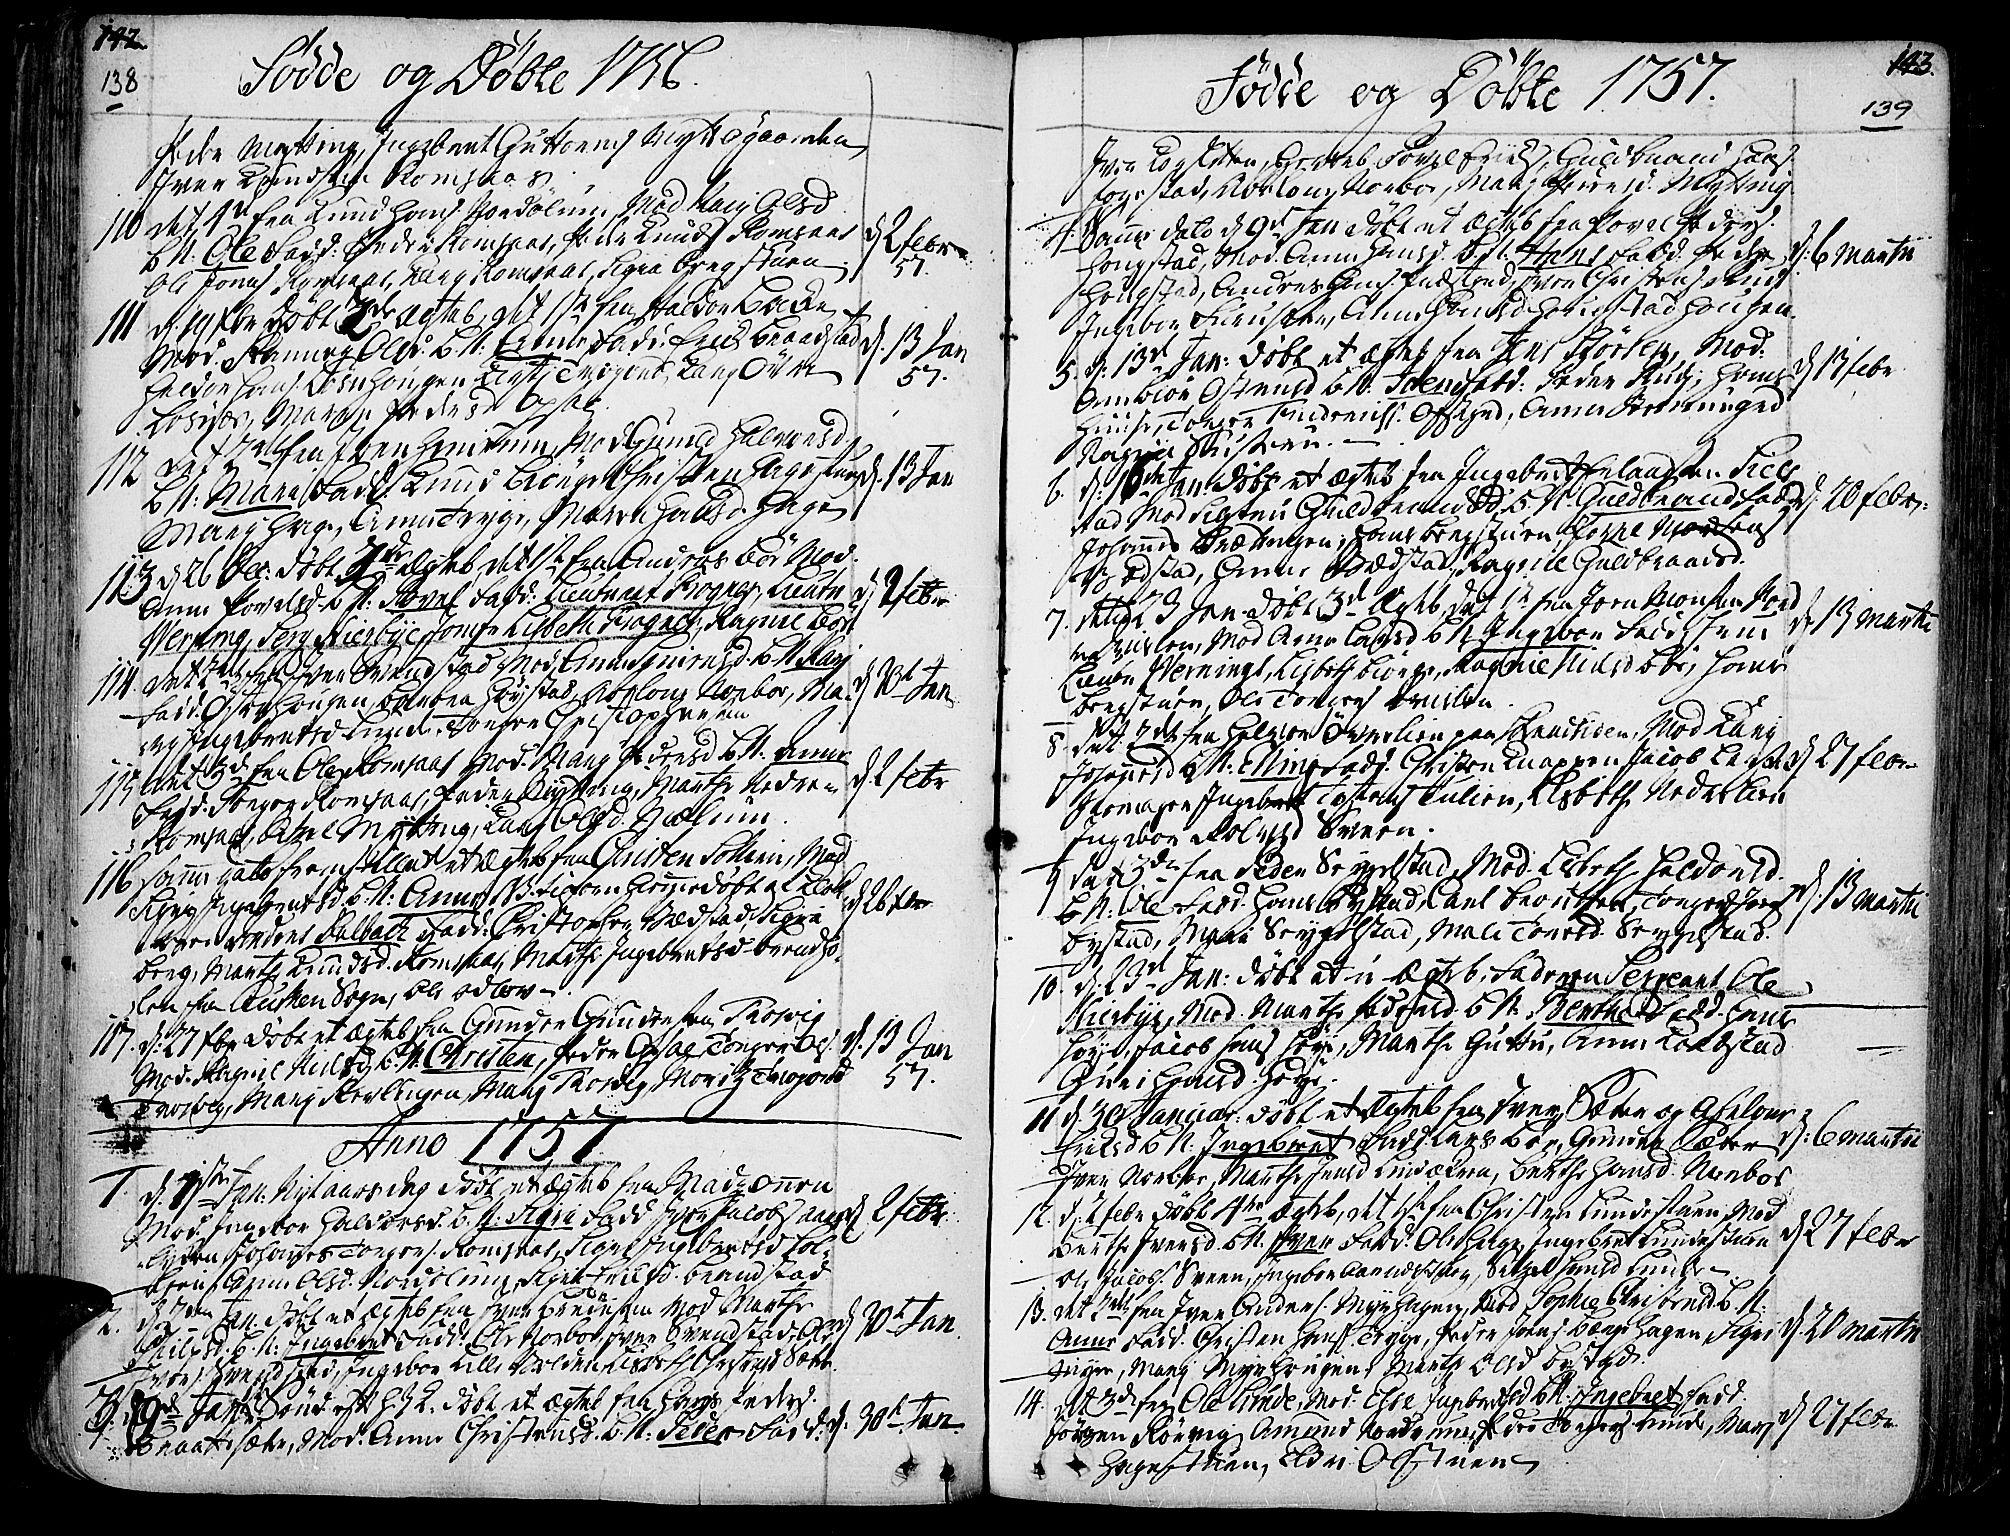 SAH, Ringebu prestekontor, Ministerialbok nr. 2, 1734-1780, s. 138-139